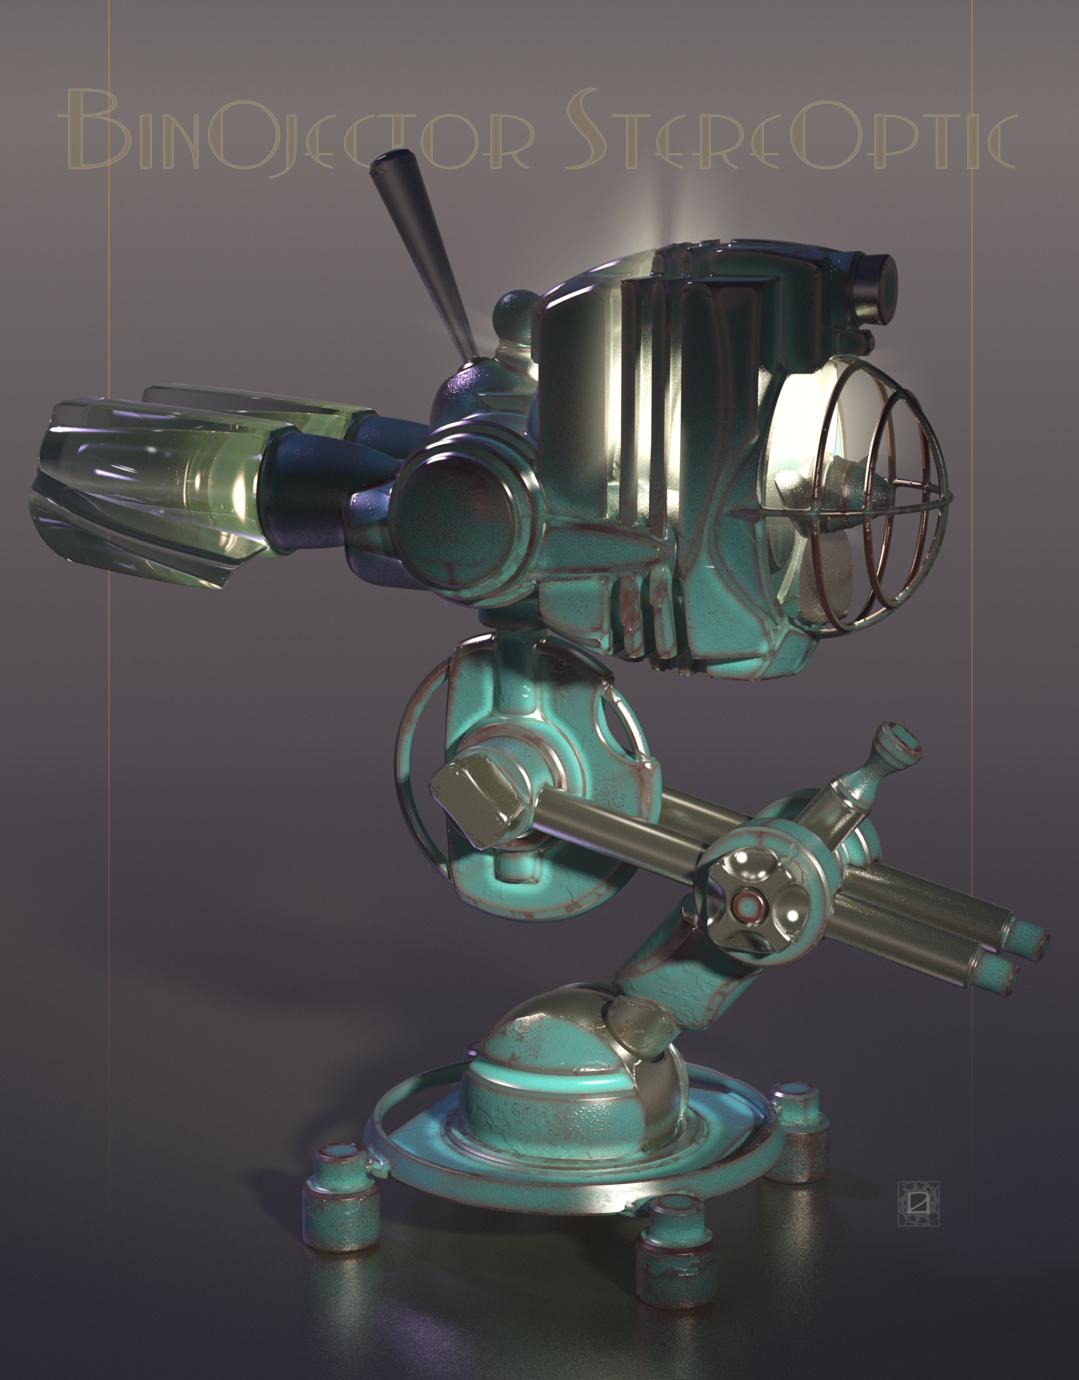 Groboto binojector stereopti 1 4b9df3e9 32yd